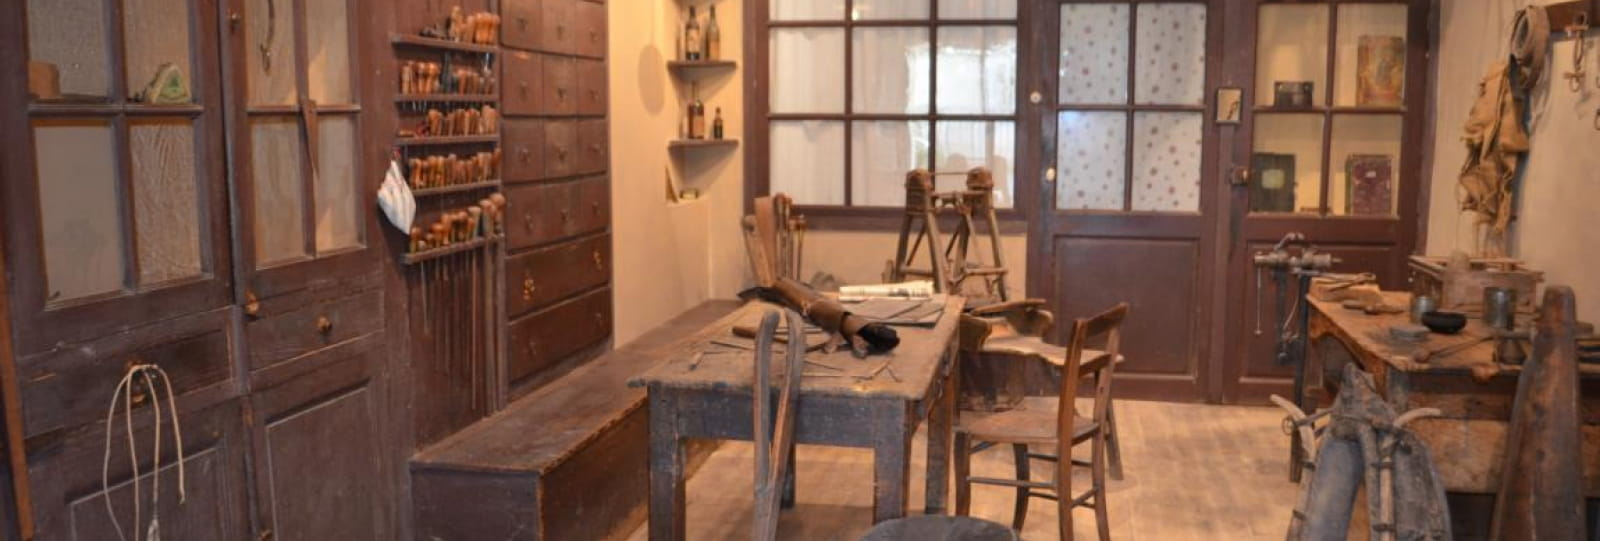 Atelier de bourrellerie - Exposition